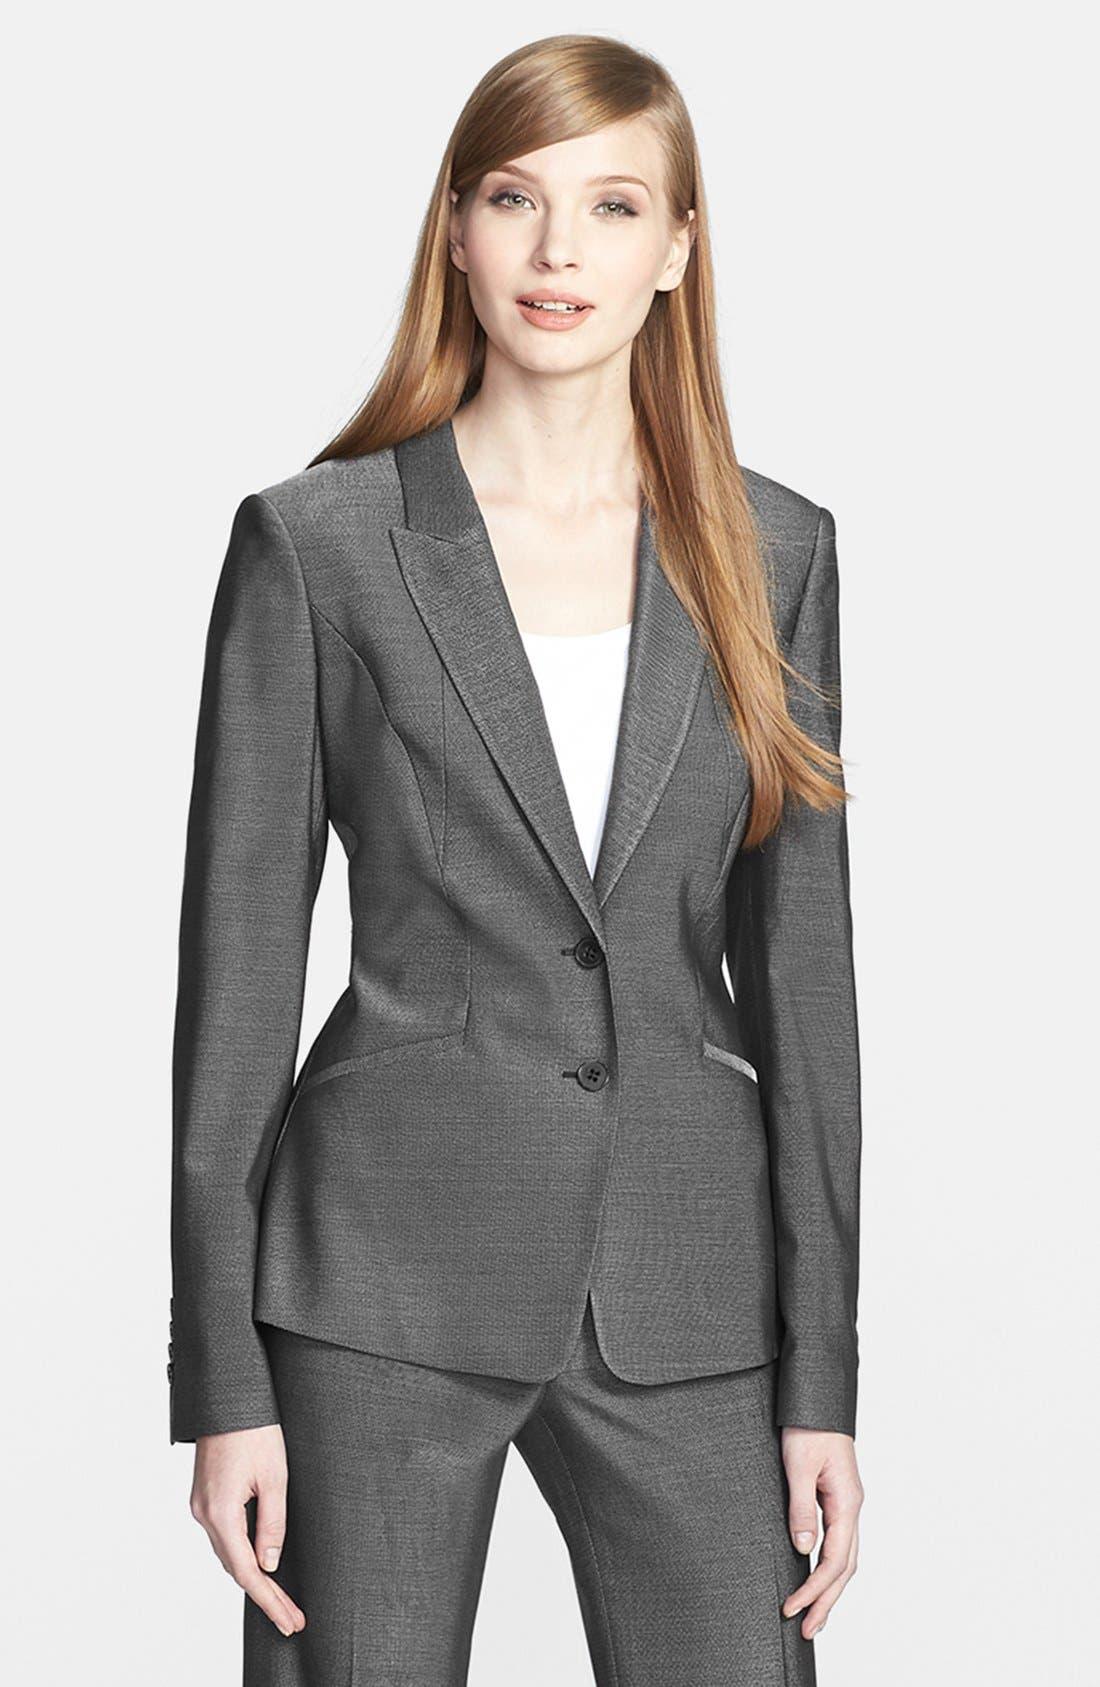 Alternate Image 1 Selected - BOSS HUGO BOSS 'Jolisa' Stretch Wool Suiting Jacket